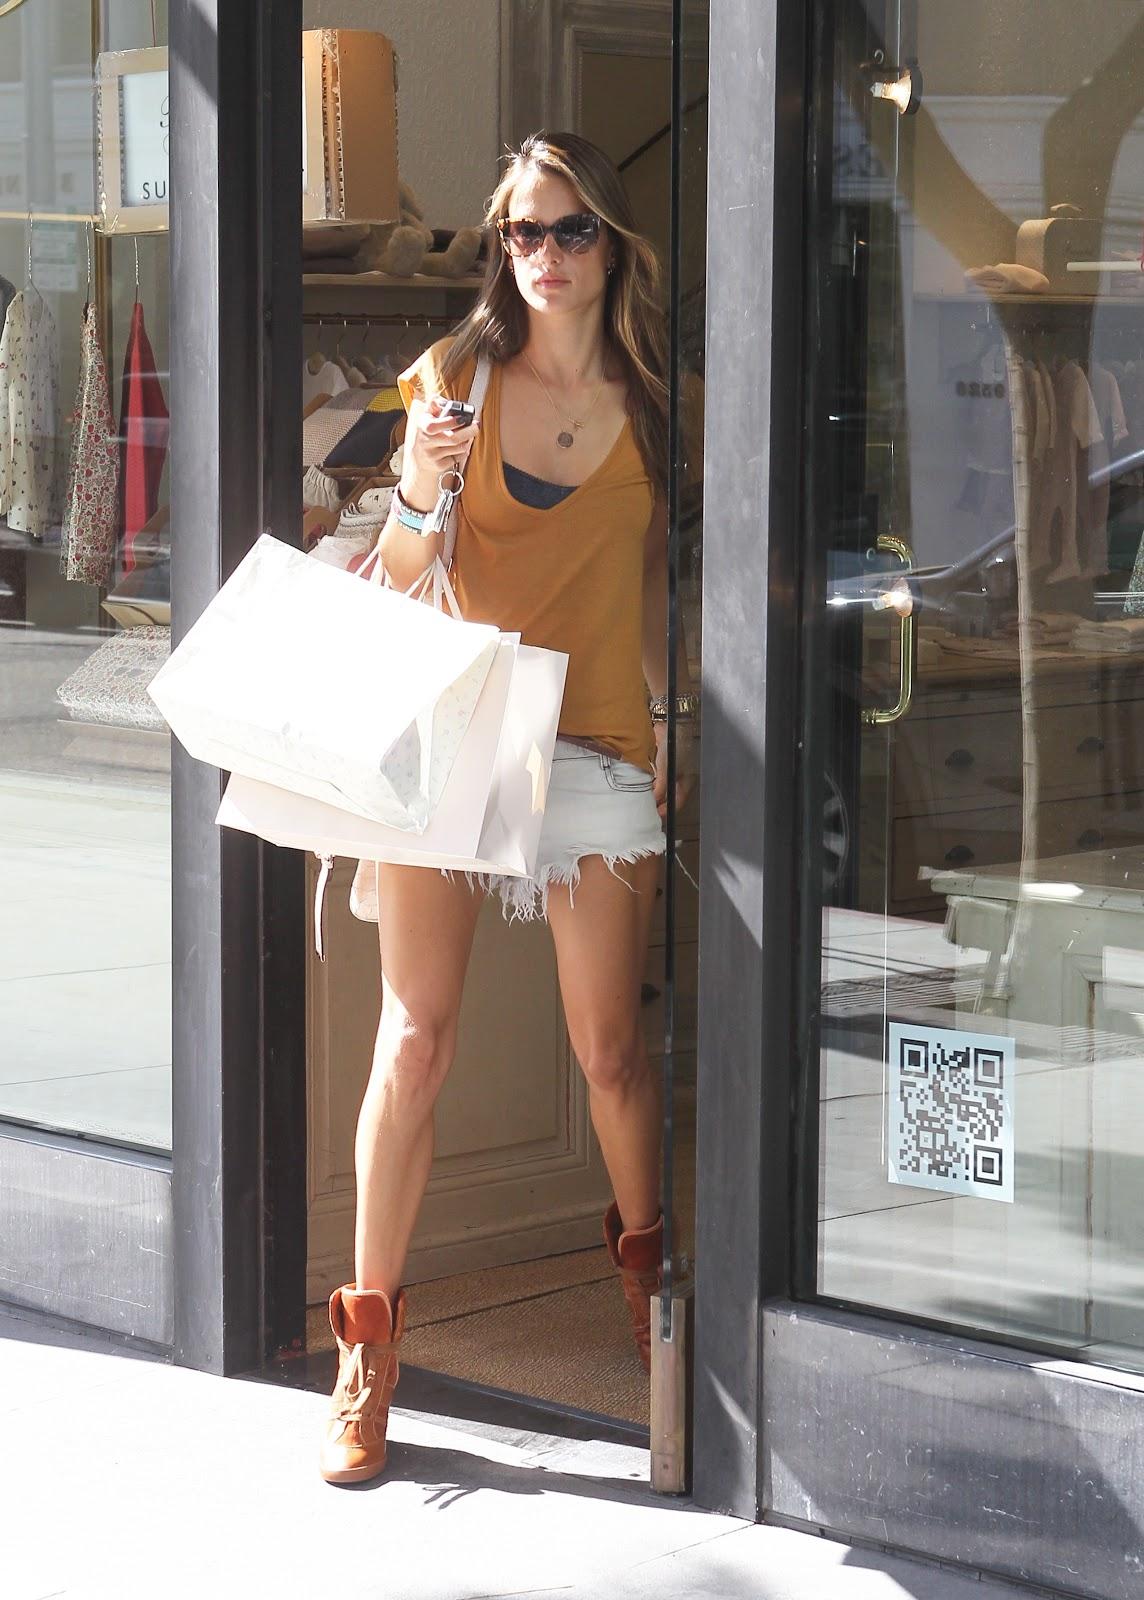 http://3.bp.blogspot.com/-88gTi1UMWs4/UHbBE7FWvWI/AAAAAAAASiQ/a8Hxr9CFYaM/s1600/Alessandra+Ambrosio++Shopping+at+Bonpoint+in+Beverly+Hills+October+9th+2012-01.jpg